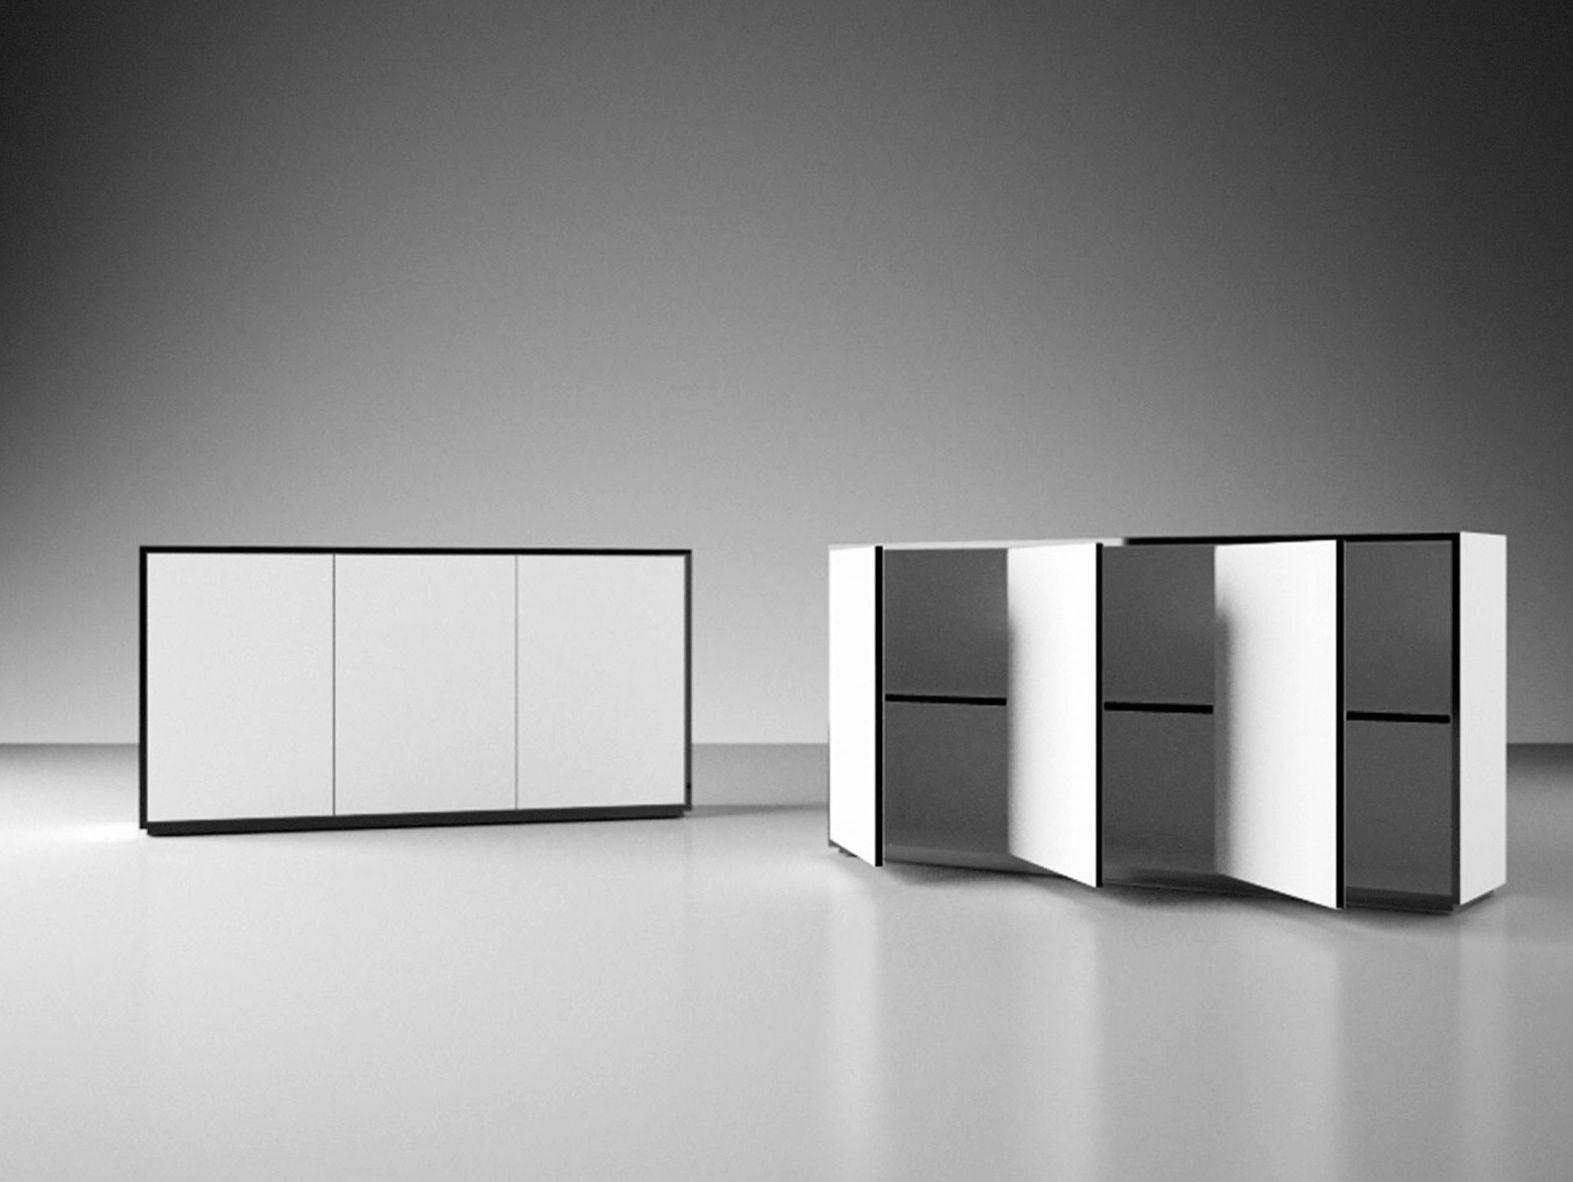 Auxilium mobile ufficio by rechteck felix schwake design for Mobile basso ufficio